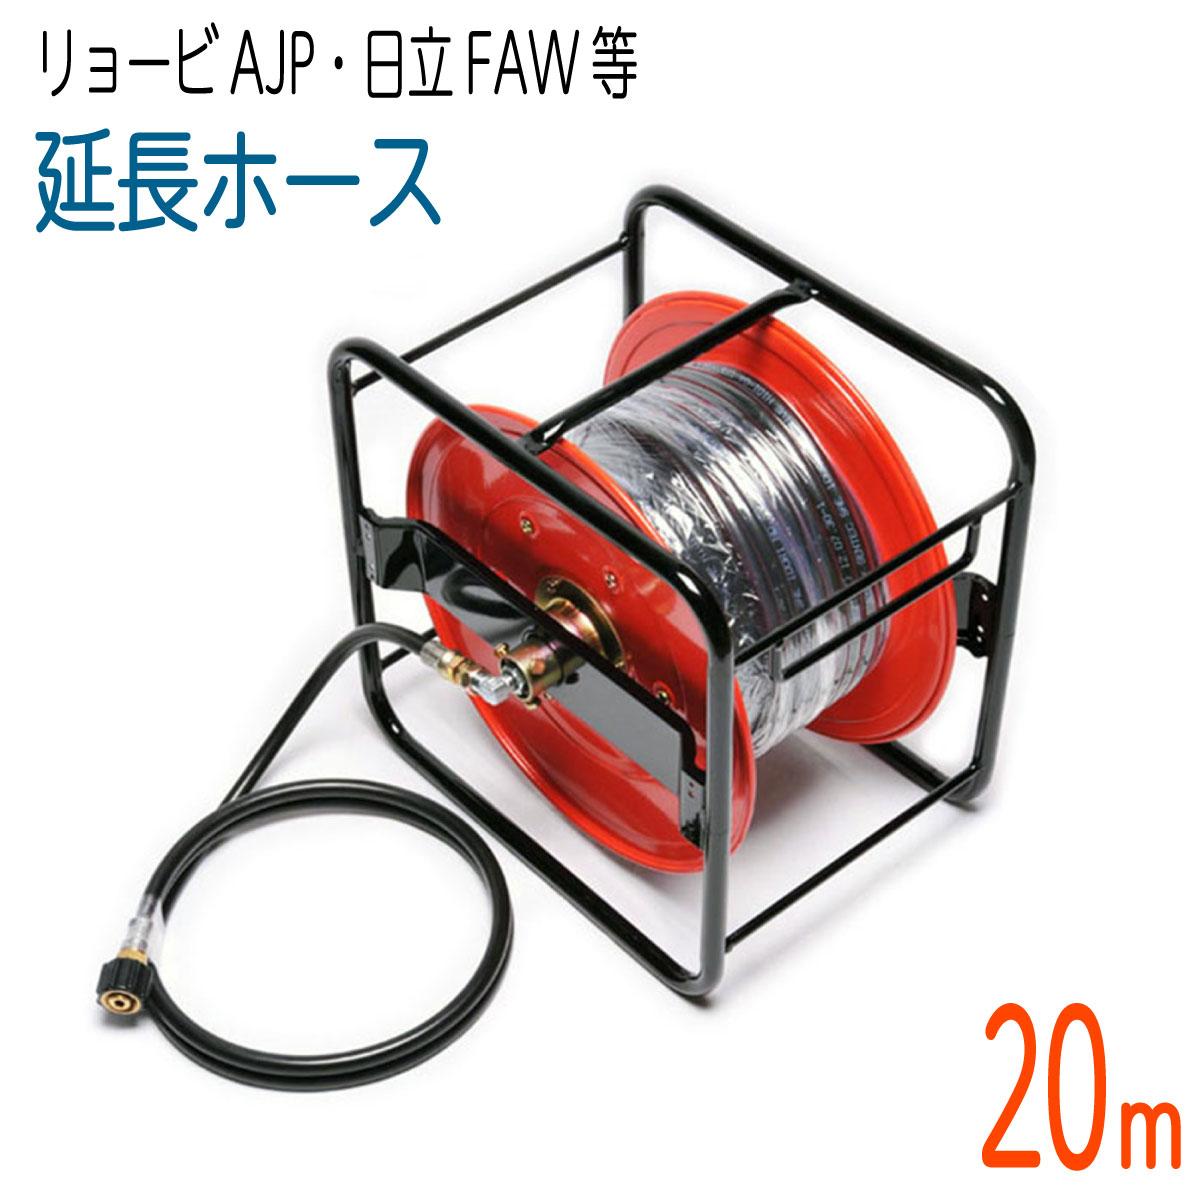 【20Mリール巻き】 リョービAJPシリーズ互換 延長用 高圧洗浄機ホース コンパクトホース